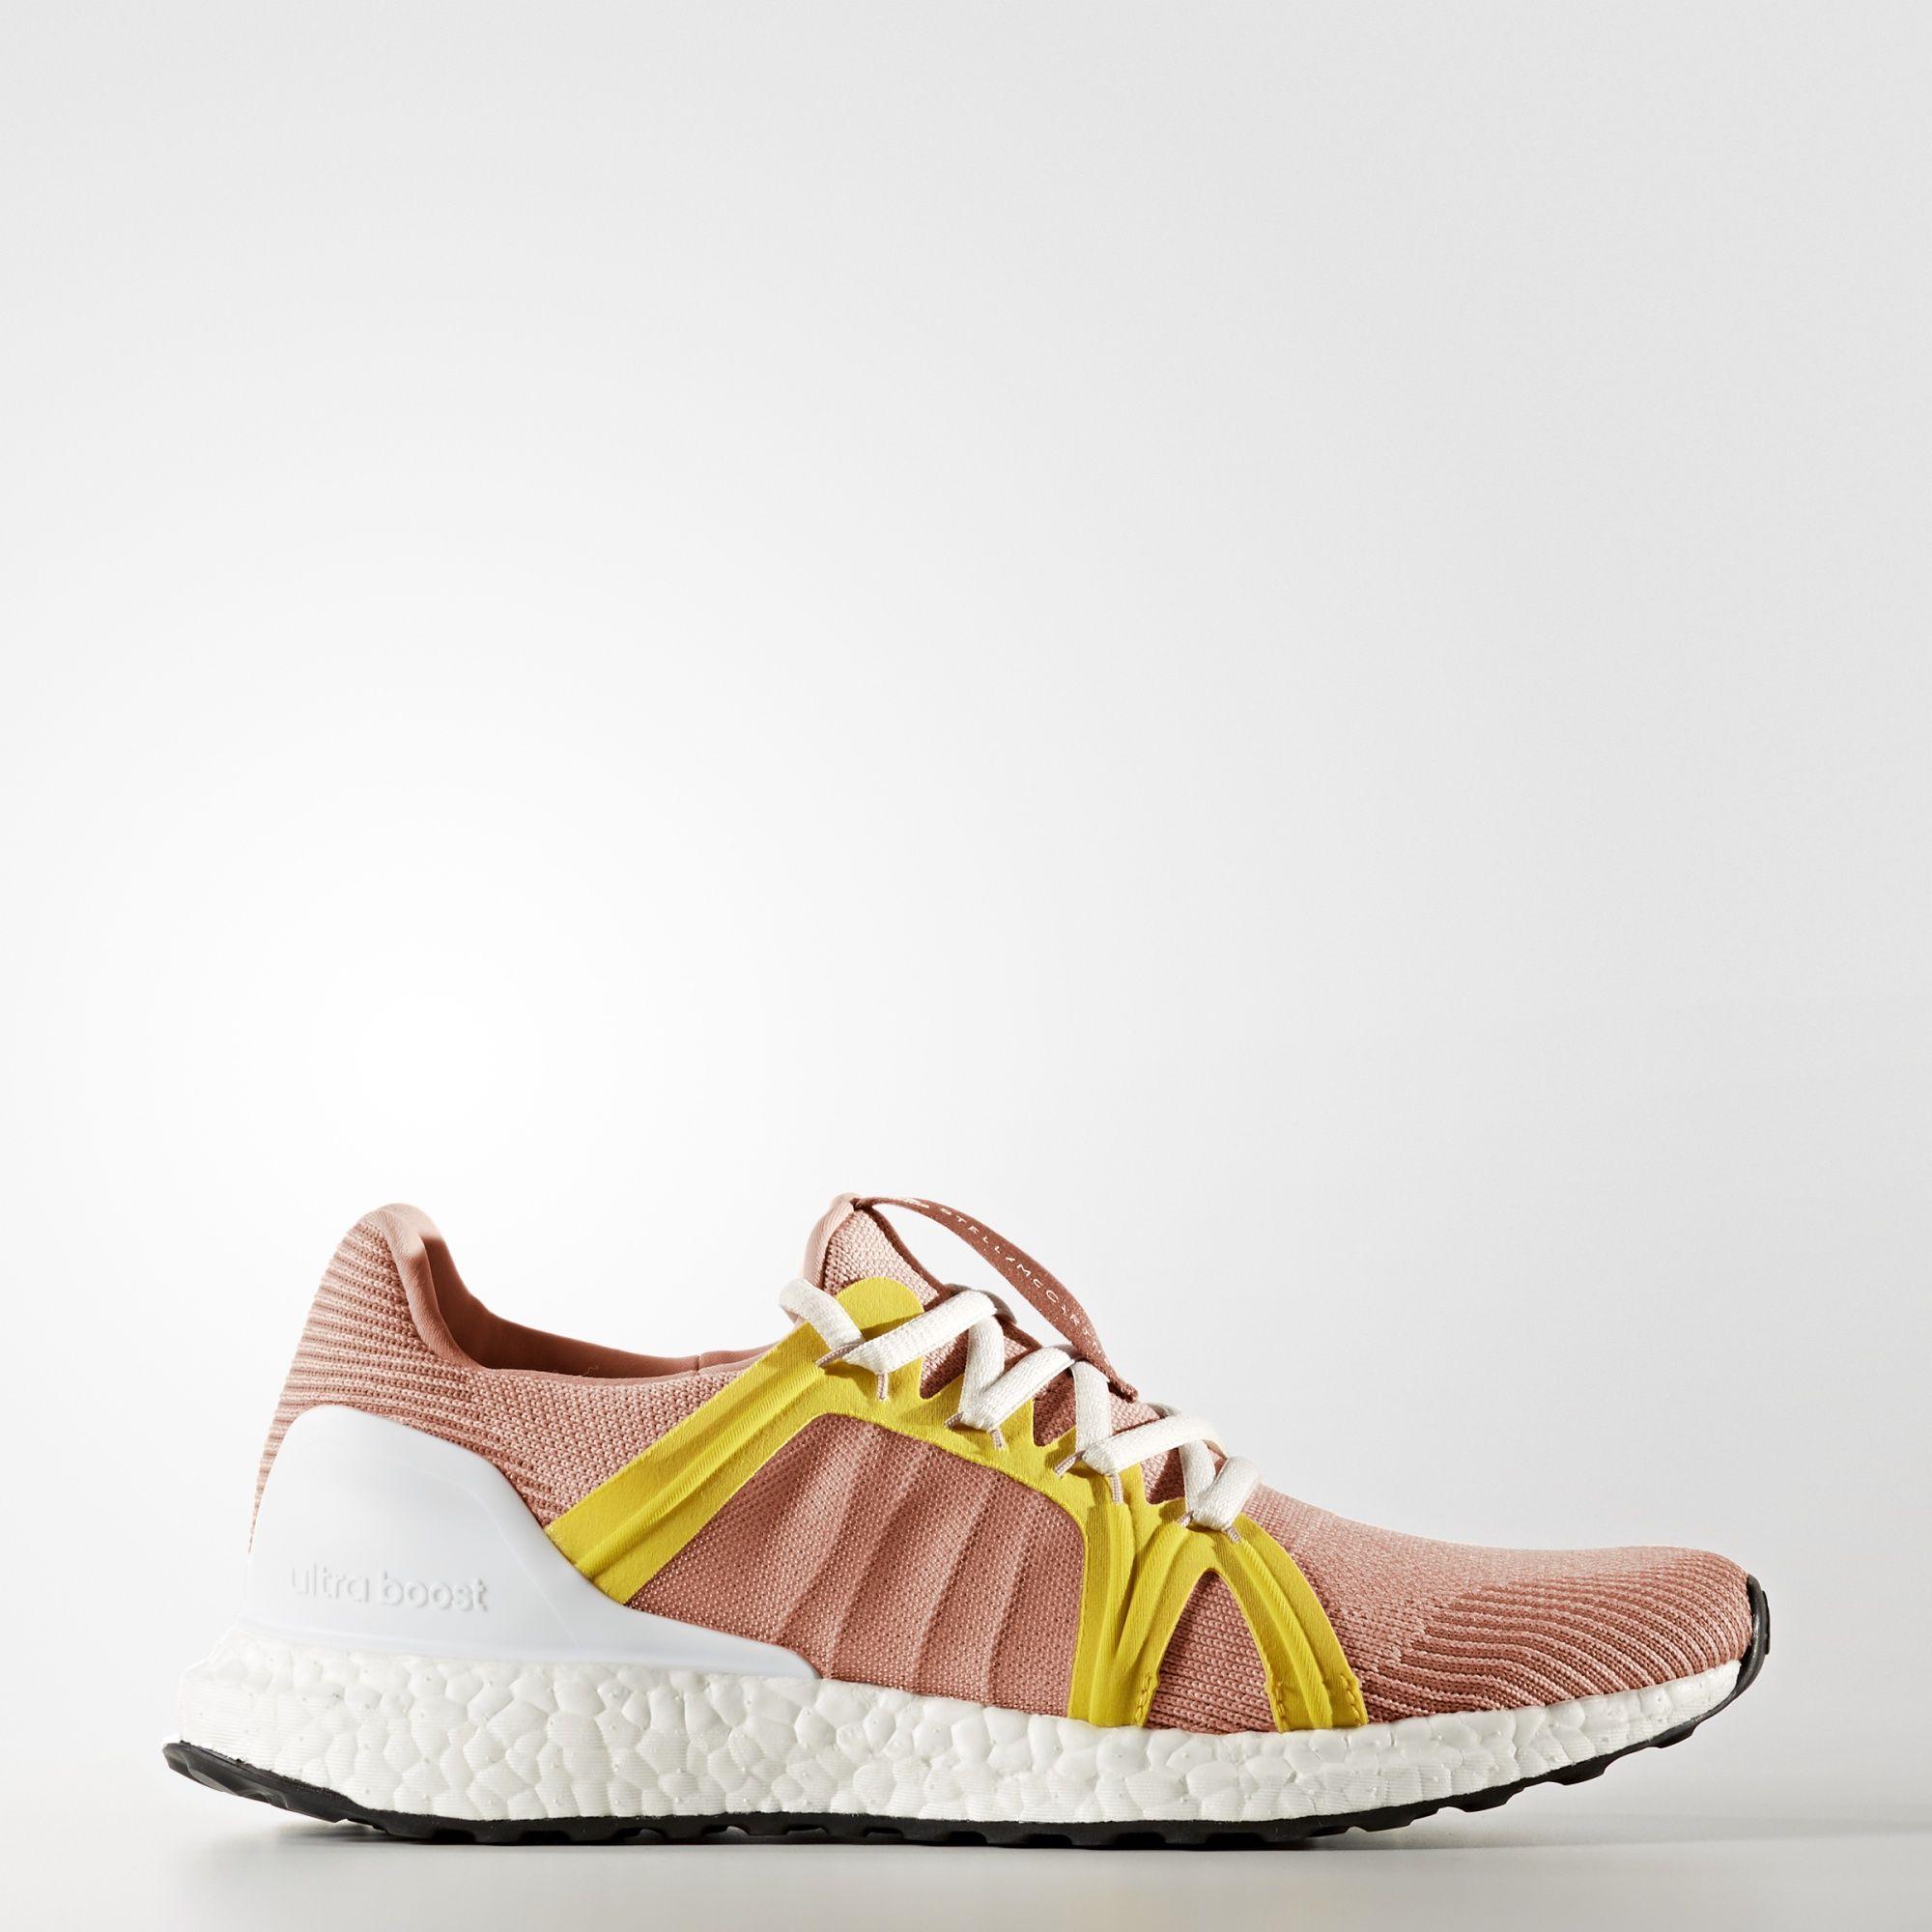 Women's UltraBoost Shoes, Adidas X Stella McCartney.